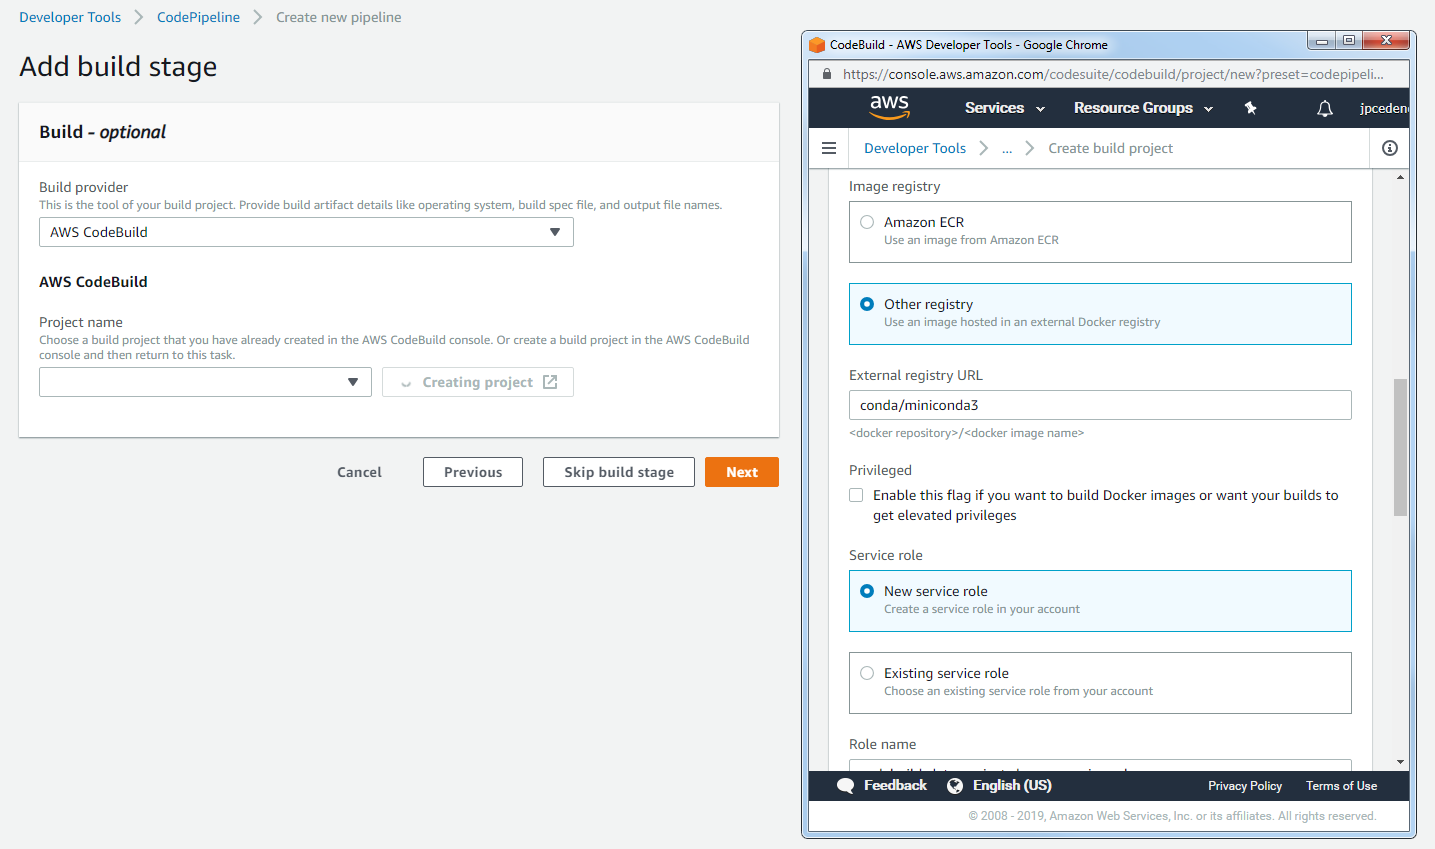 Specify a custom Docker image for build server